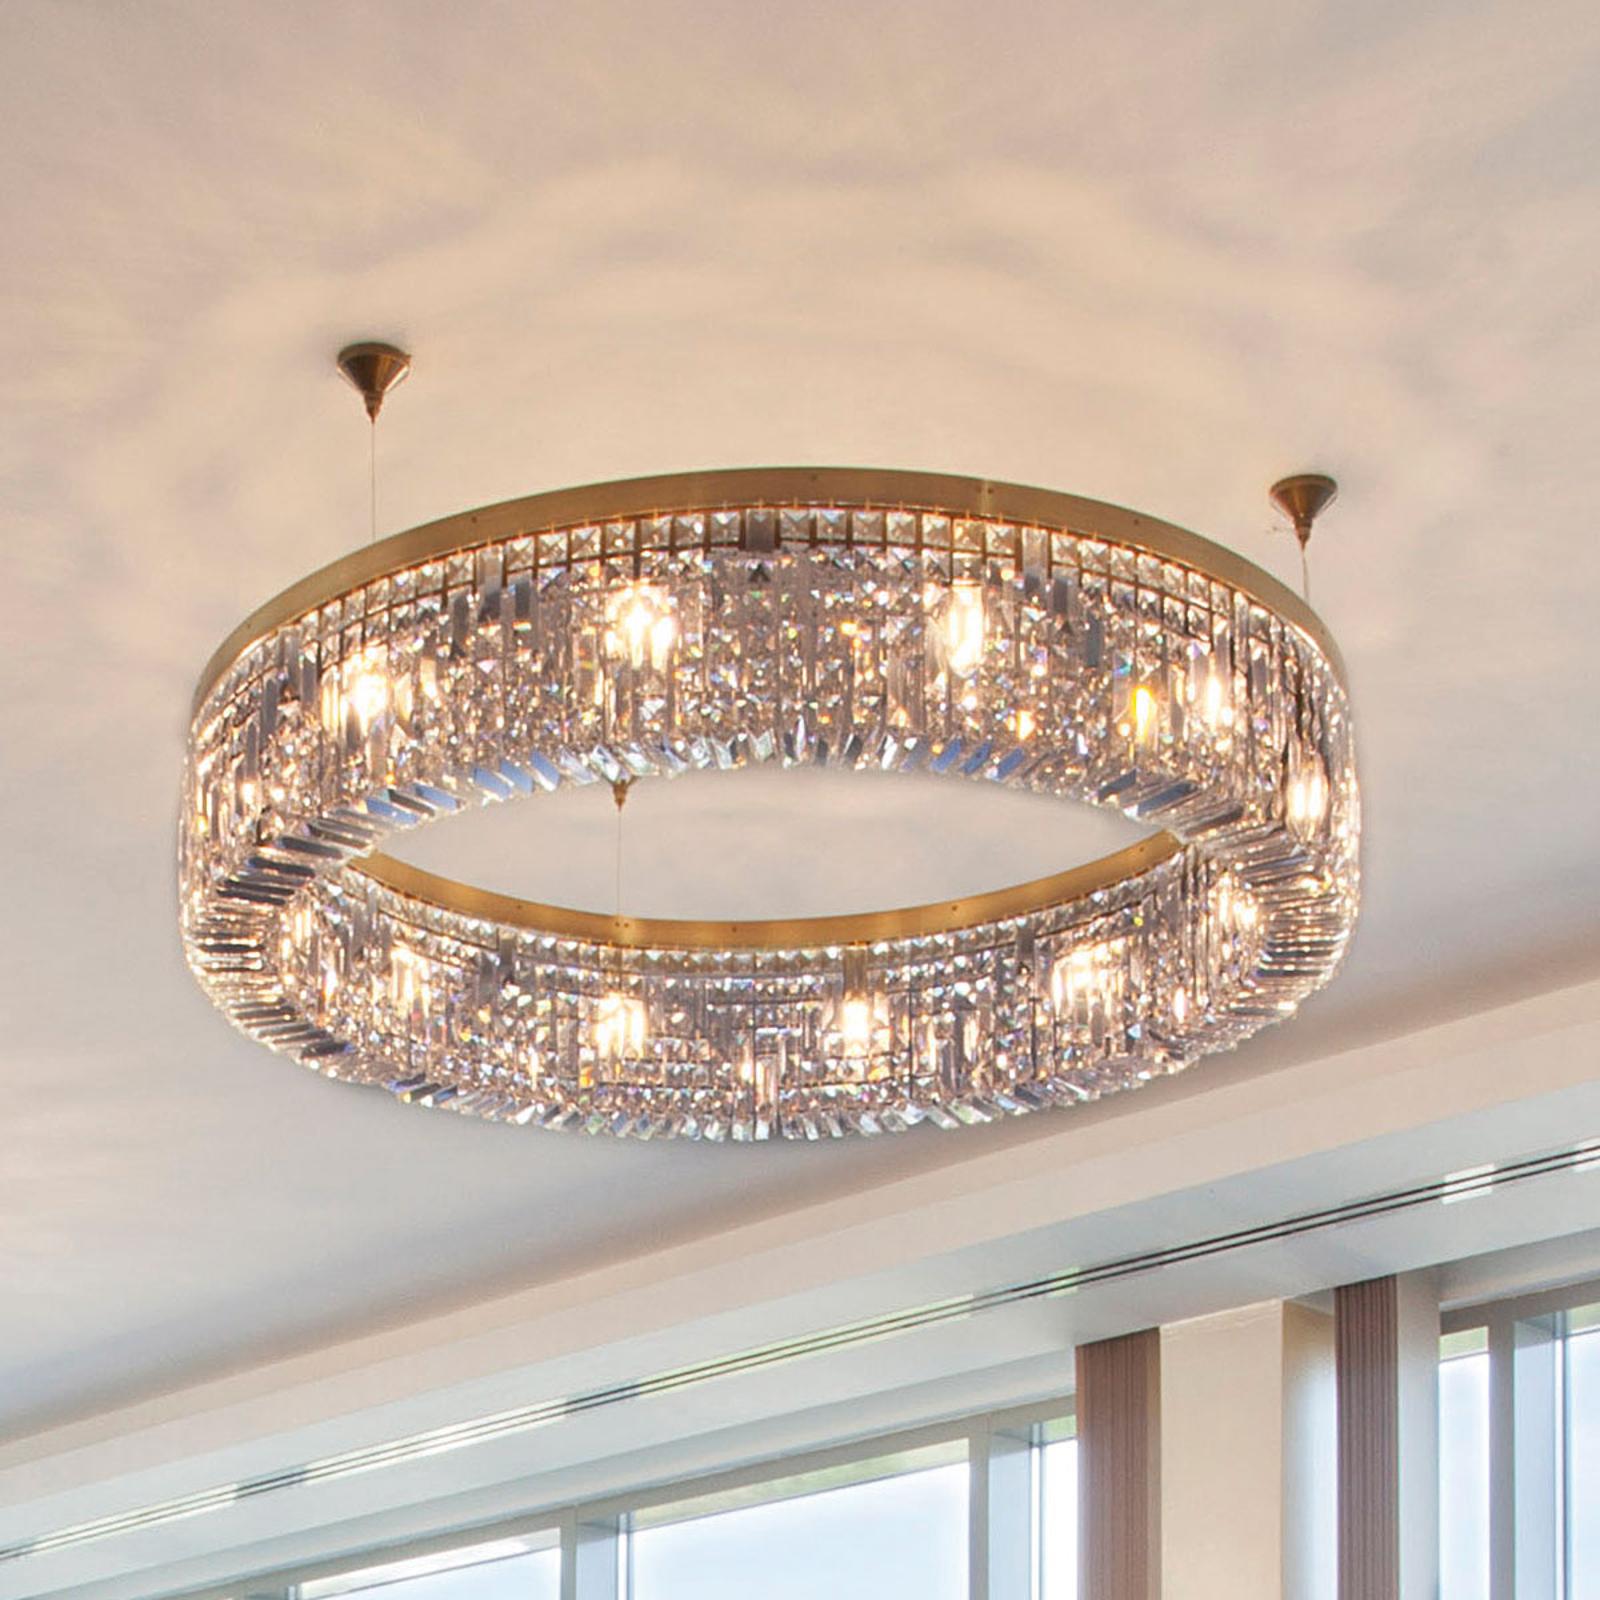 Glanzend kristallen hanglamp Ring 100 cm goud